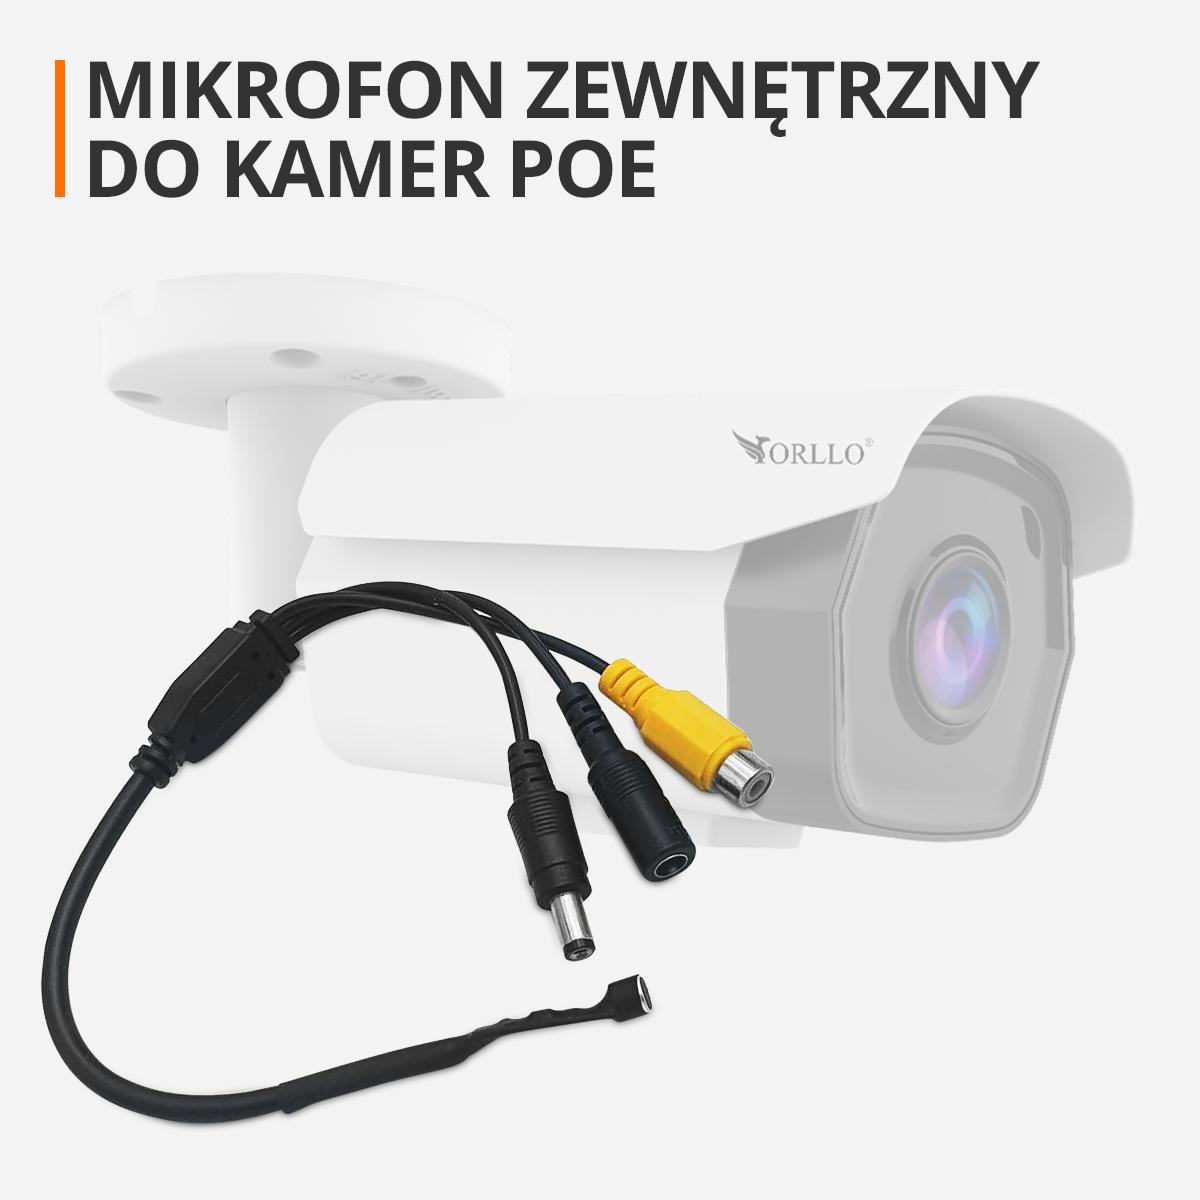 mikrofon-zewnetrzny-do-kamer-monitoringu-poe